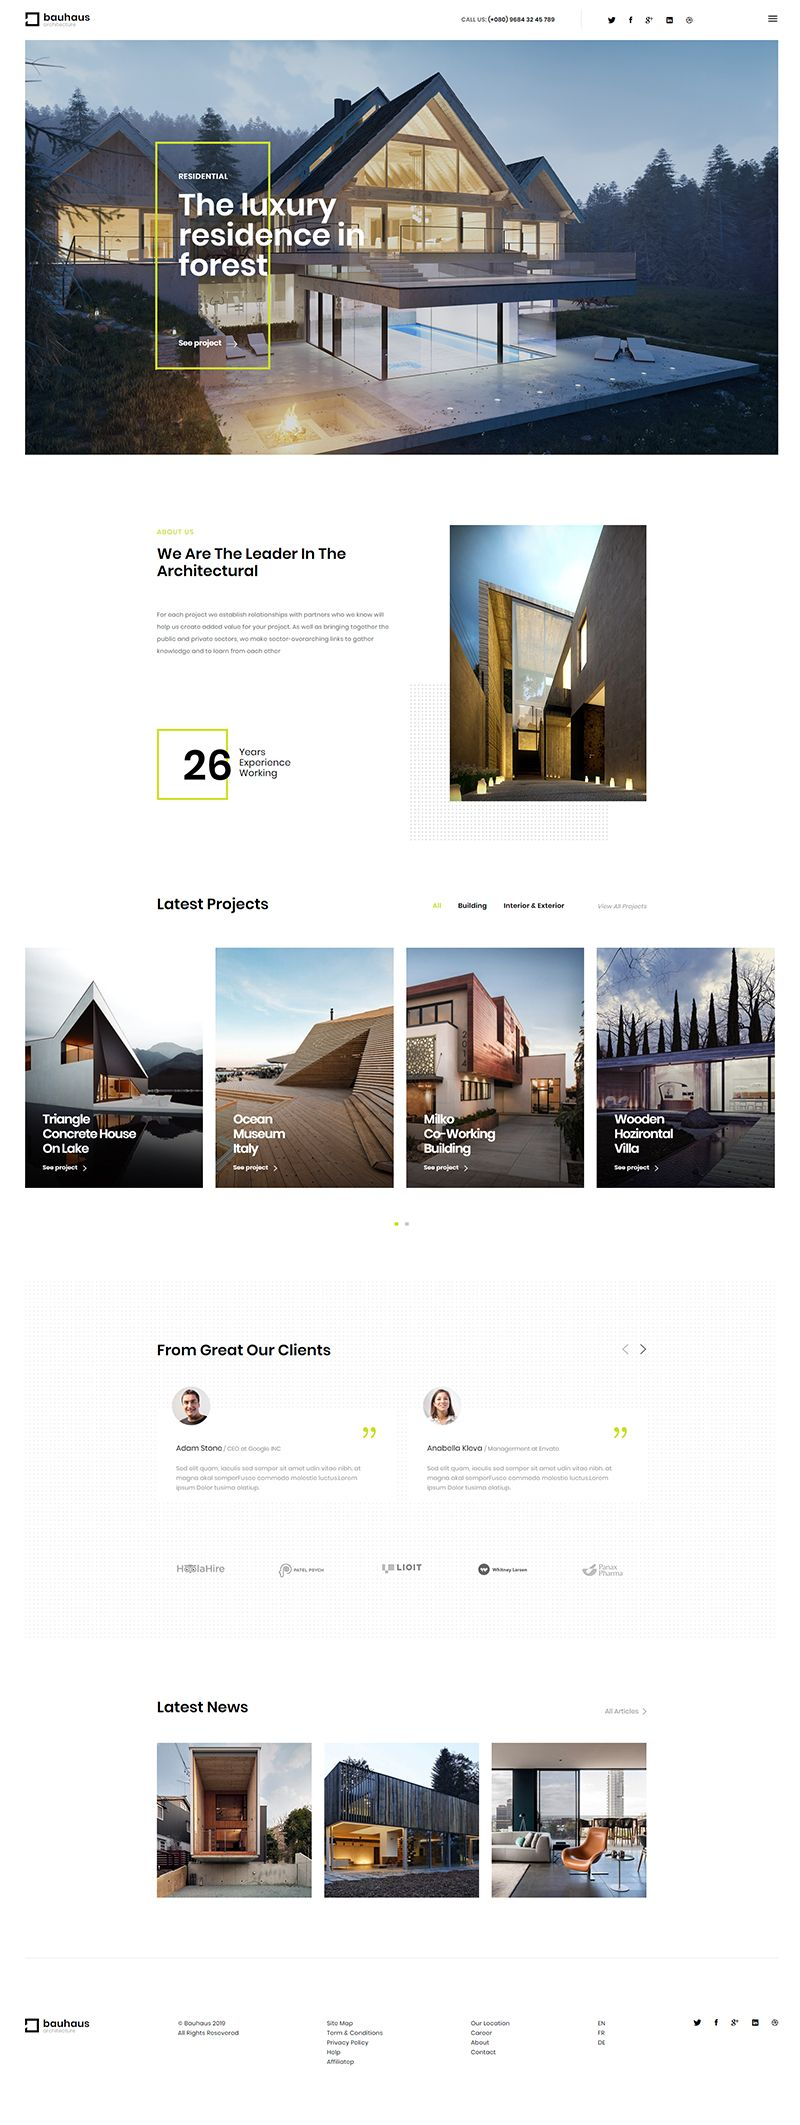 25 Outstanding Wordpress Themes For Architects 2020 Wpklik Architect Portfolio Design Layout Architecture Architecture Portfolio Design